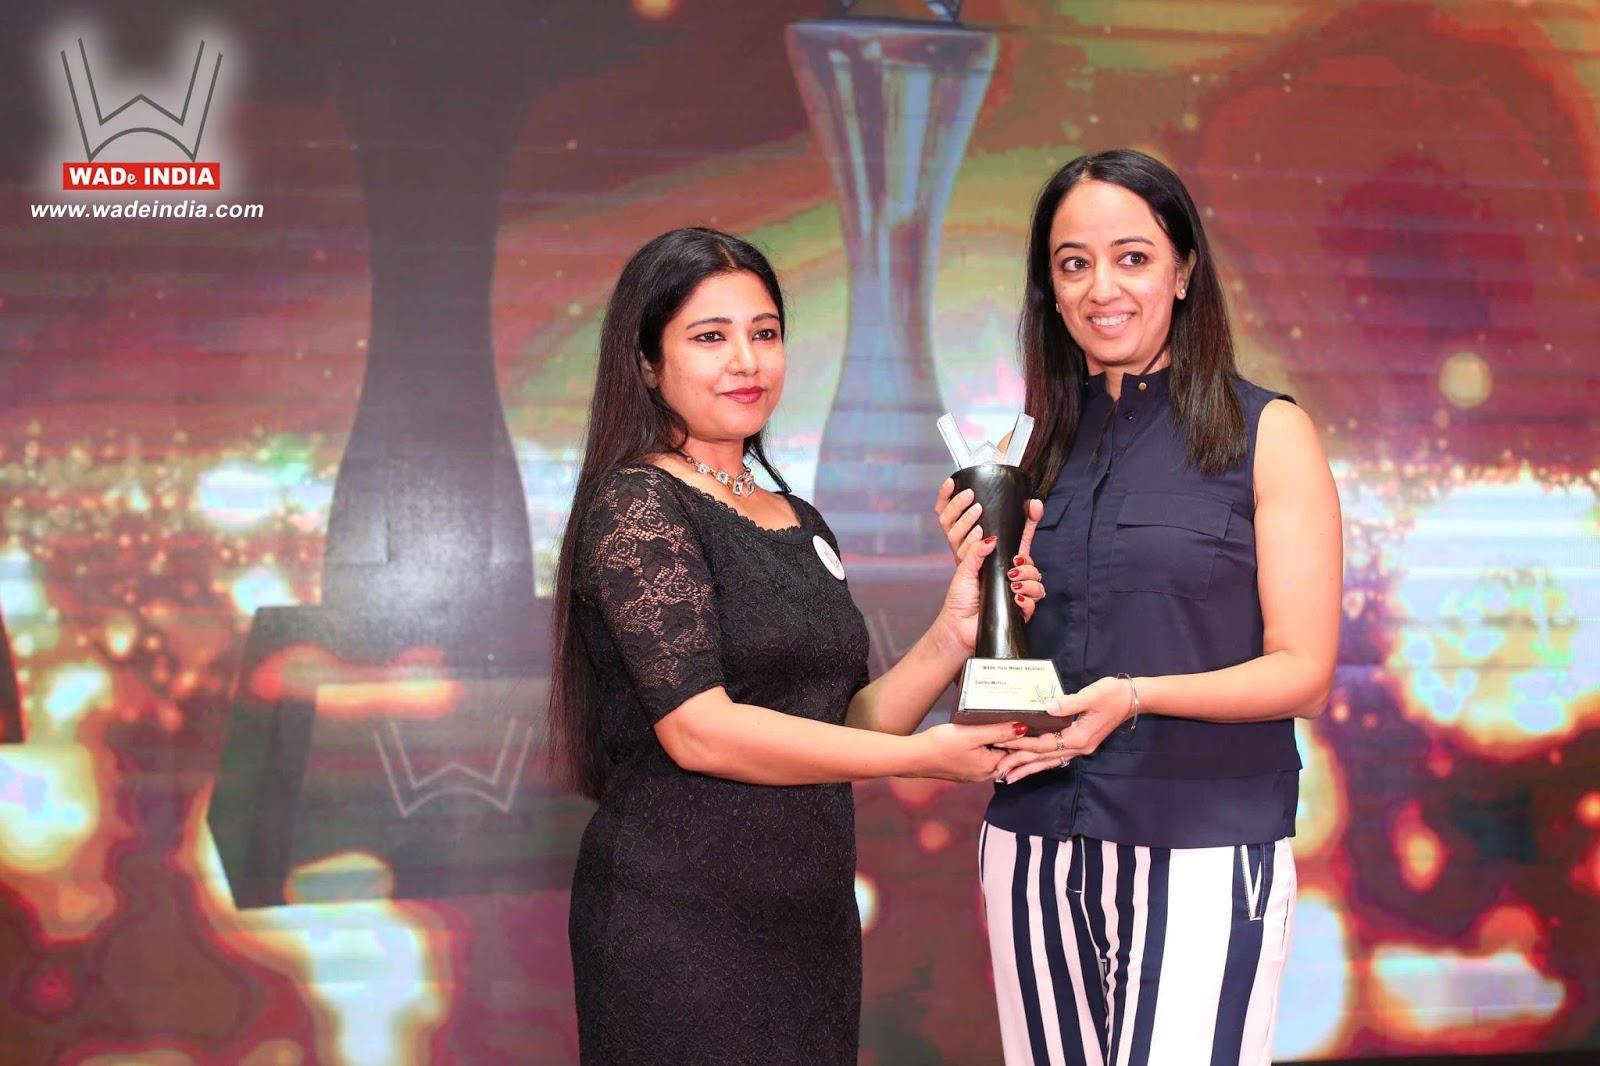 Wade India Women Architects Interior Designers Awards